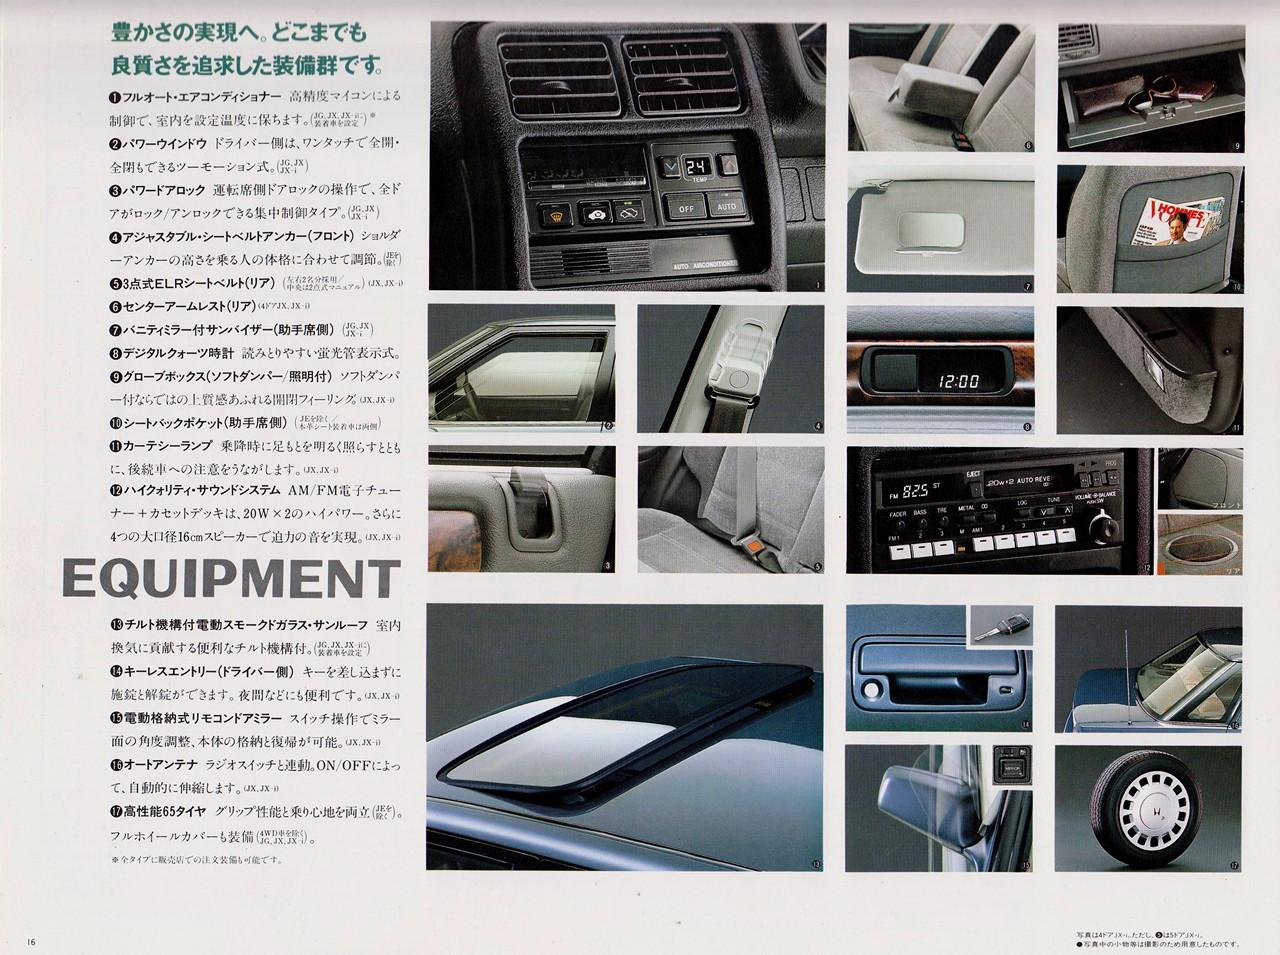 Honda Concerto, w środku, dodatki, equipment